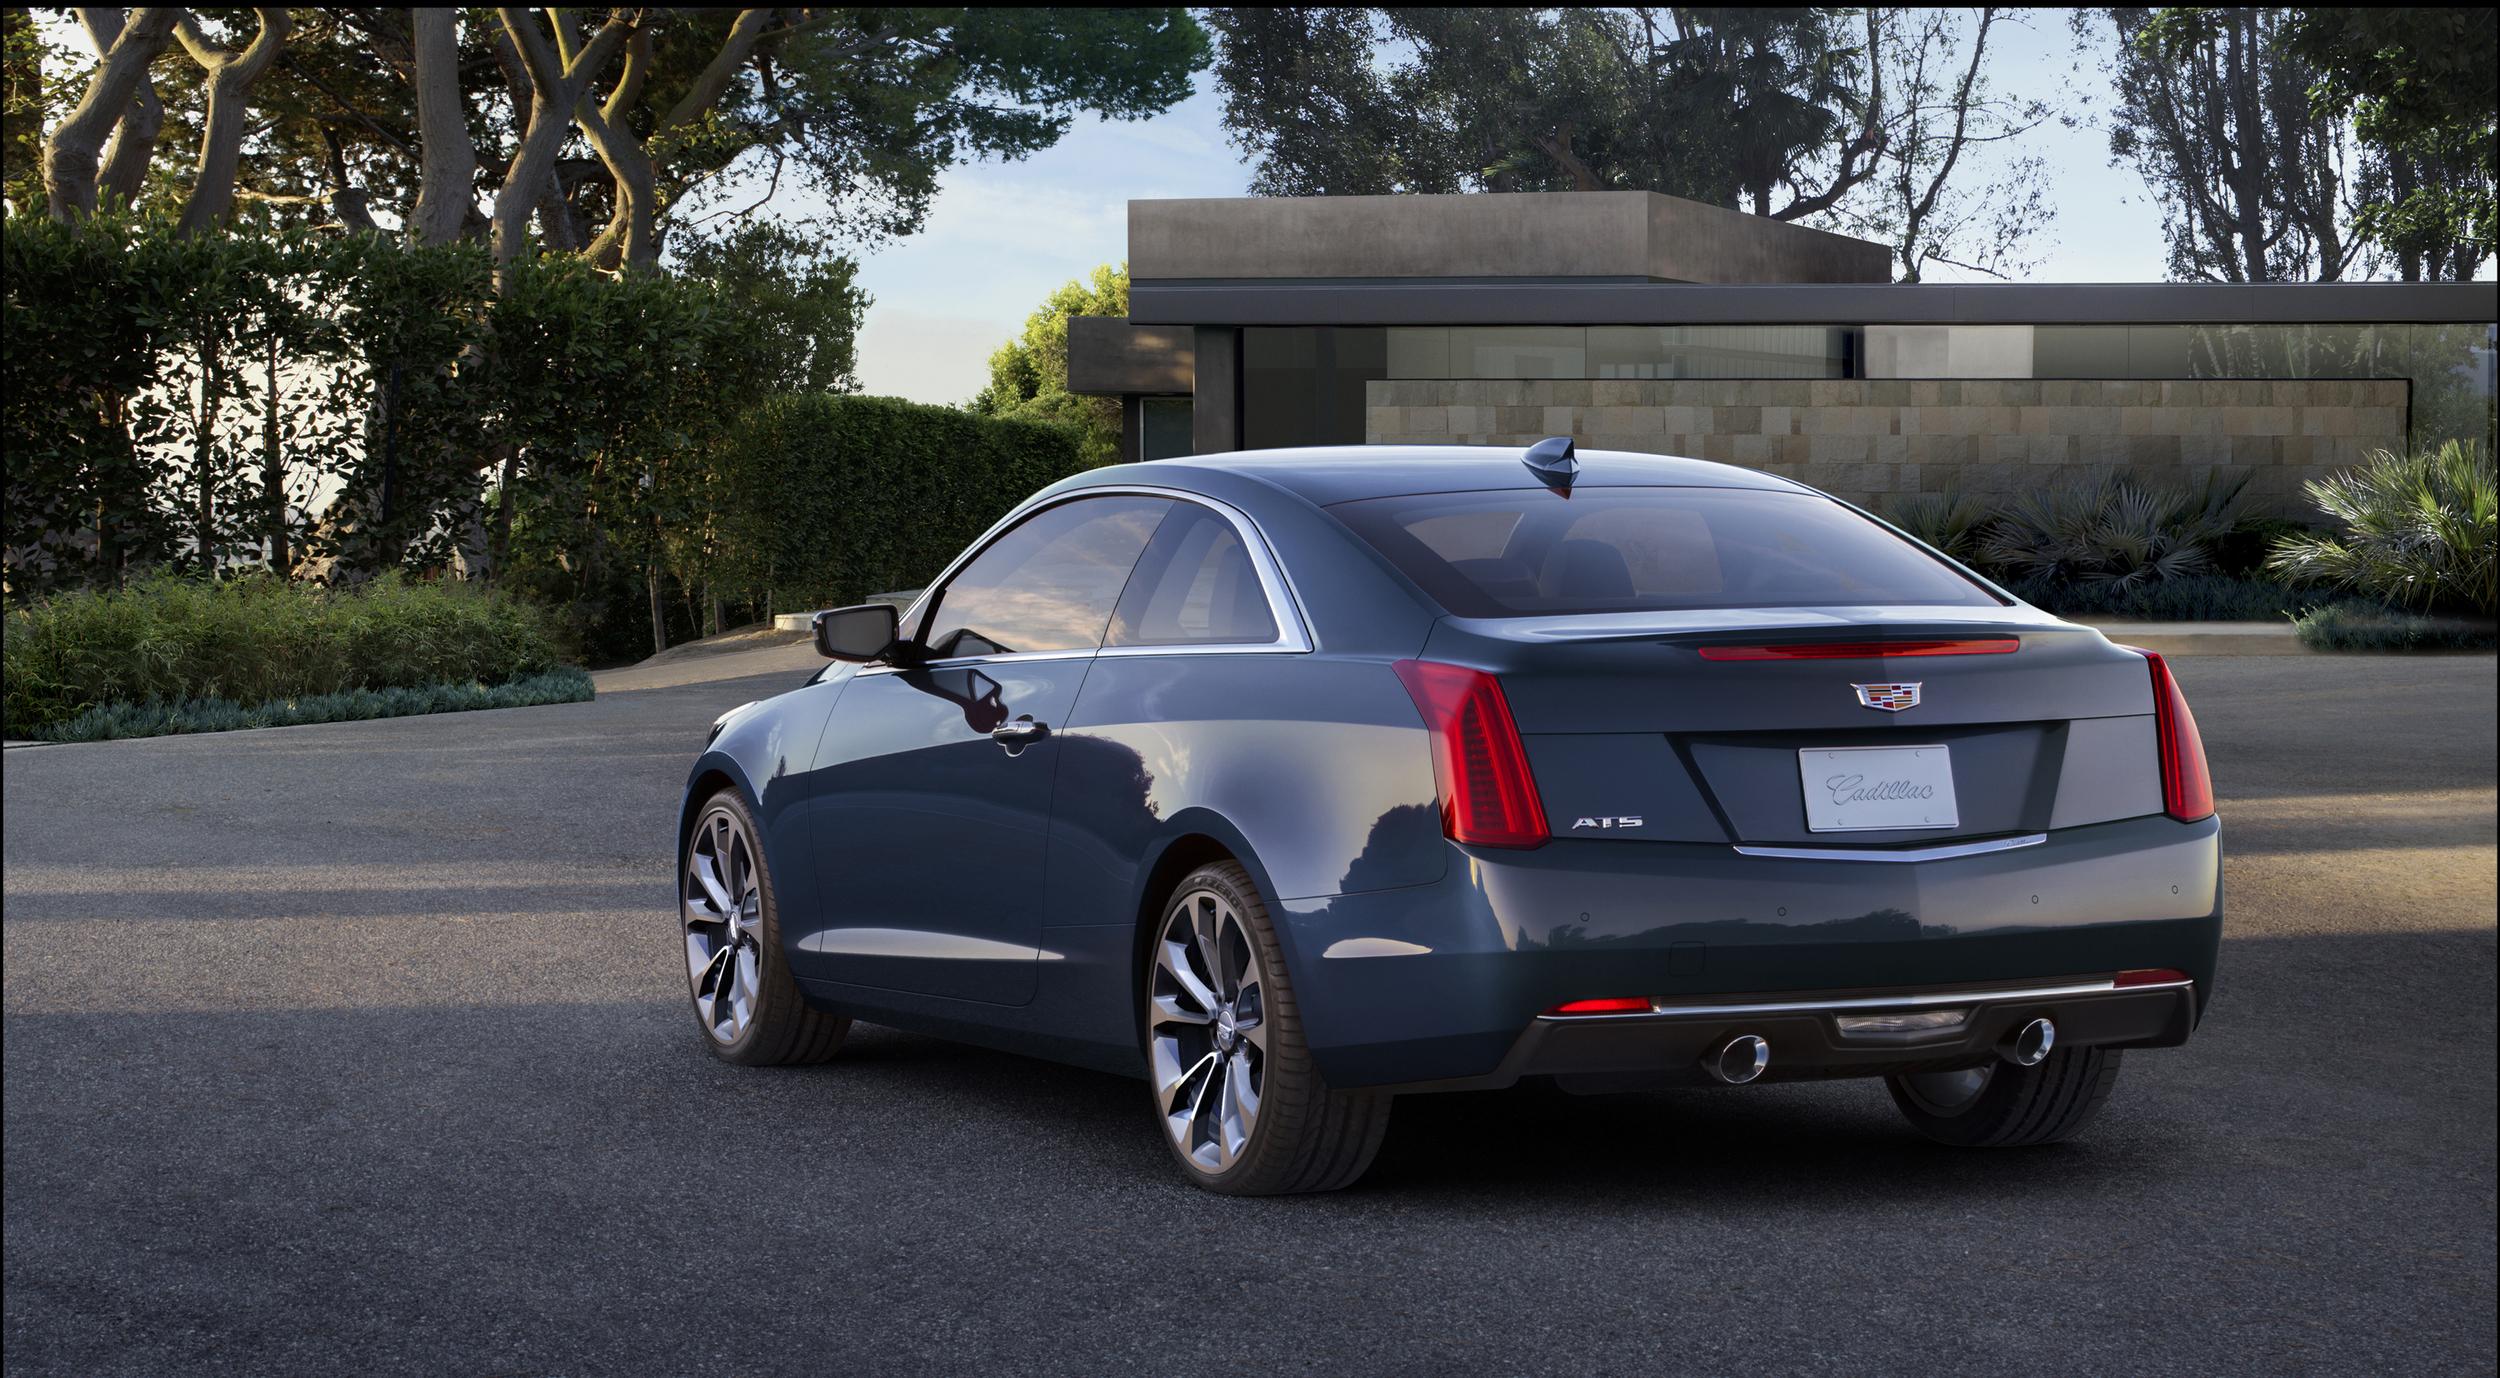 2015-Cadillac-ATScoupe-010.jpg